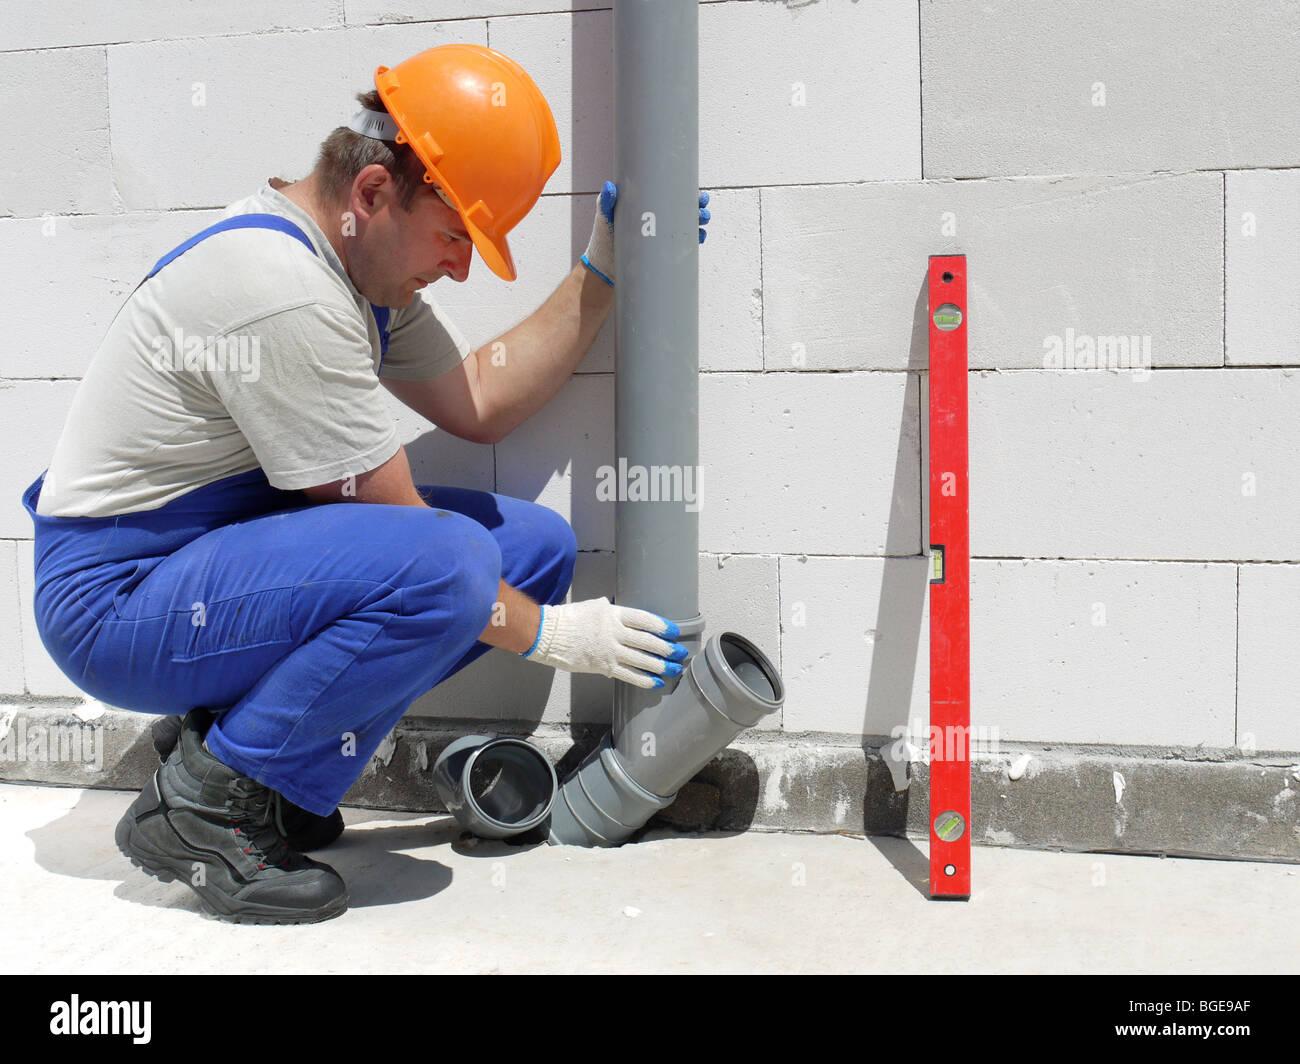 Plumber assembling pvc sewage pipes inside unfinished house - Stock Image